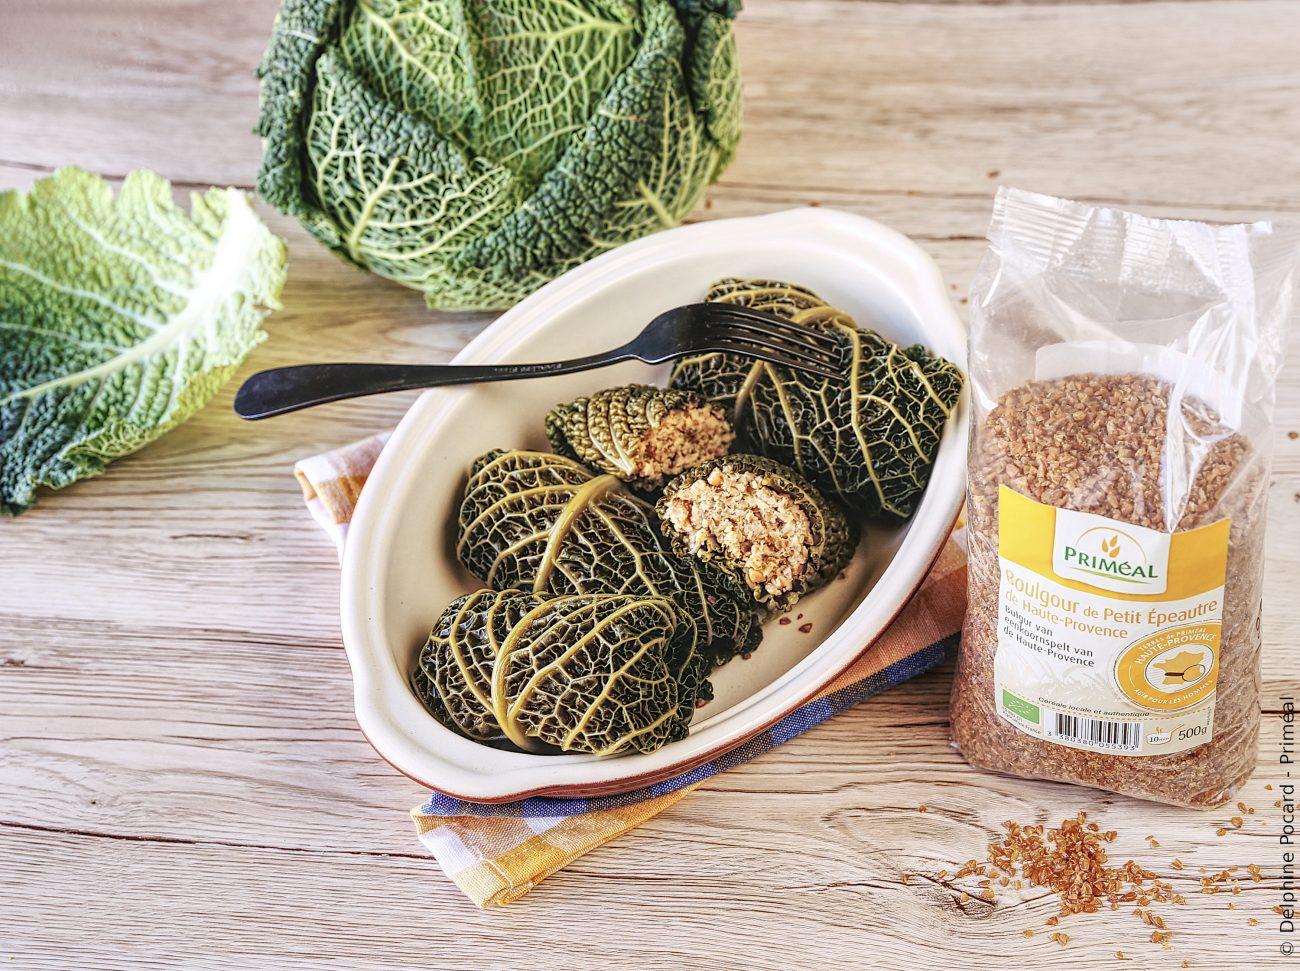 Paupiettes bio et veggie, boulgour et chou